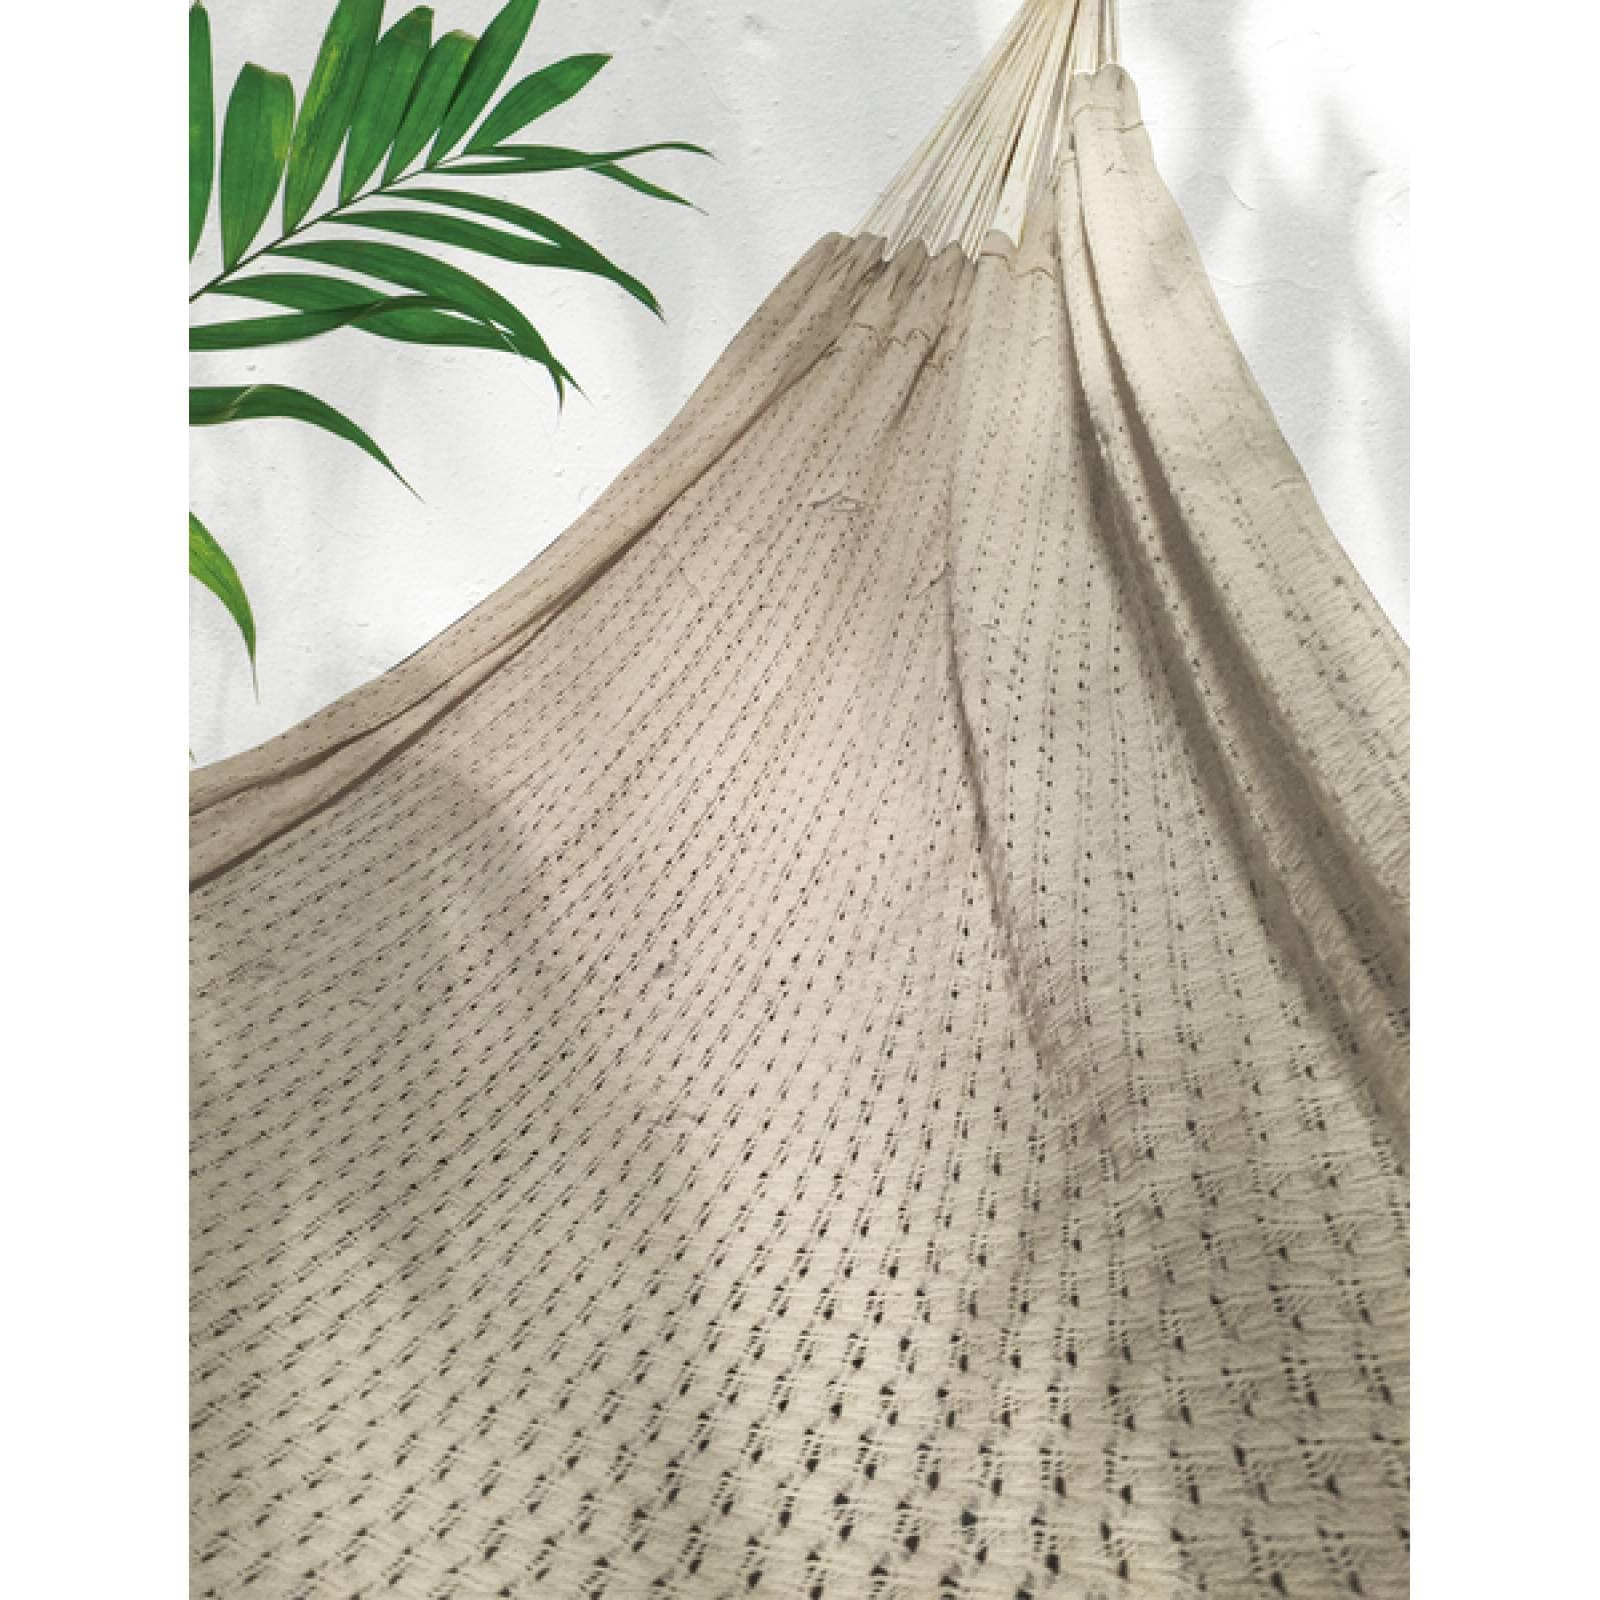 Hamaca Cotton 100% Artesanal Mayaca Premium